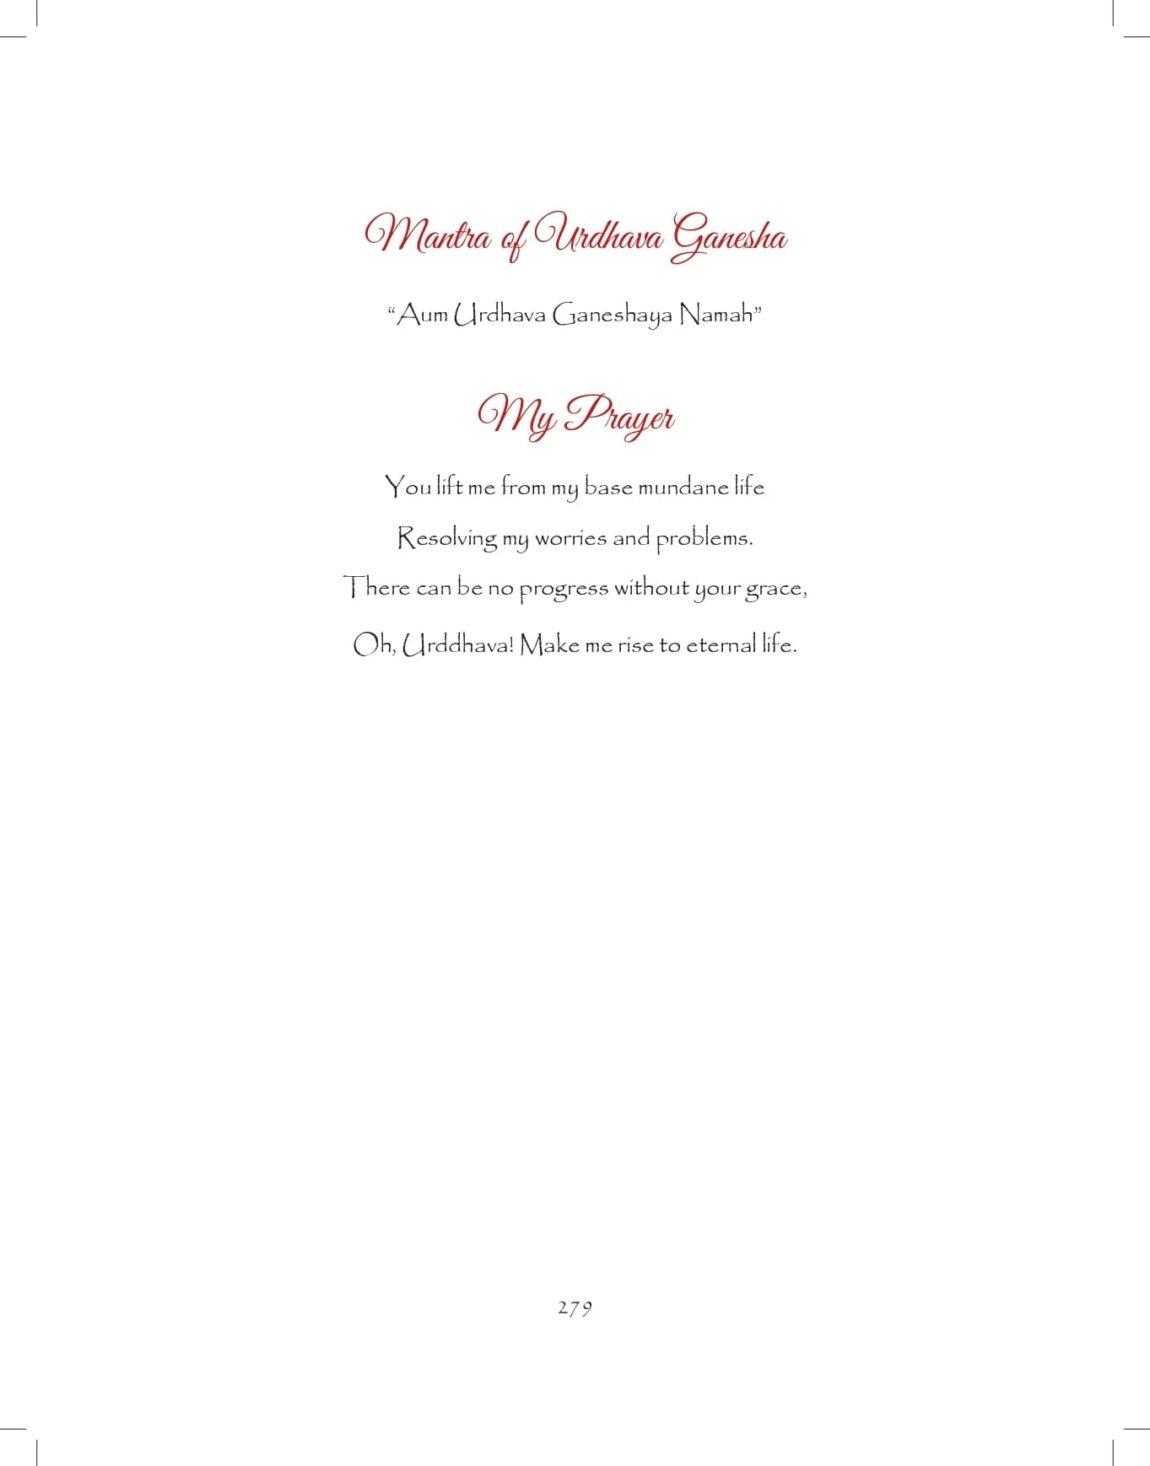 Ganesh-print_pages-to-jpg-0279.jpg